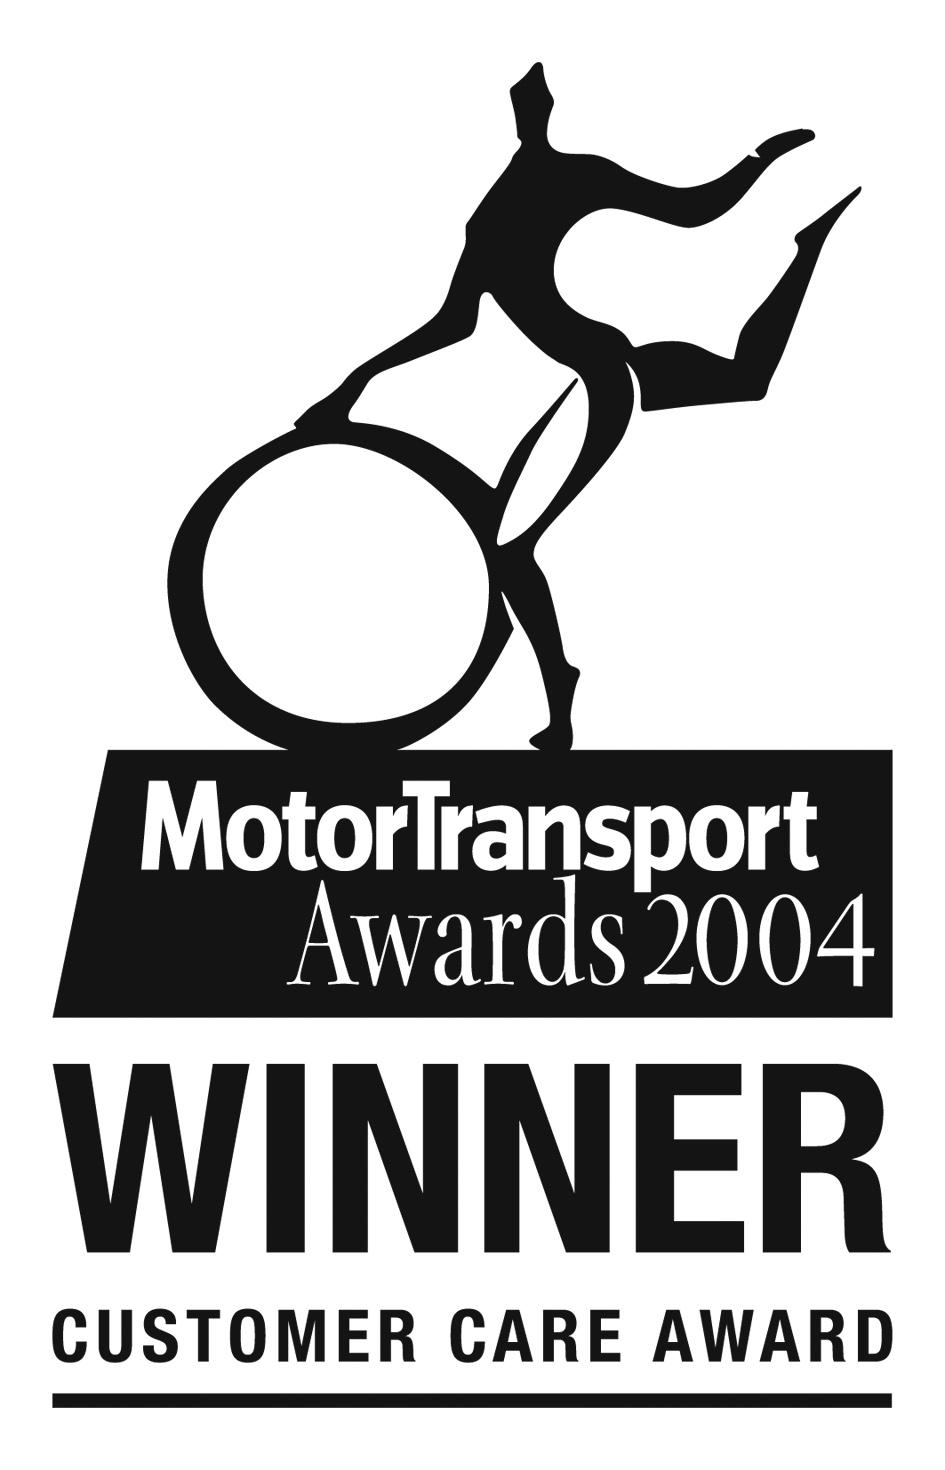 MT_win_awards_customer_care_04.jpg